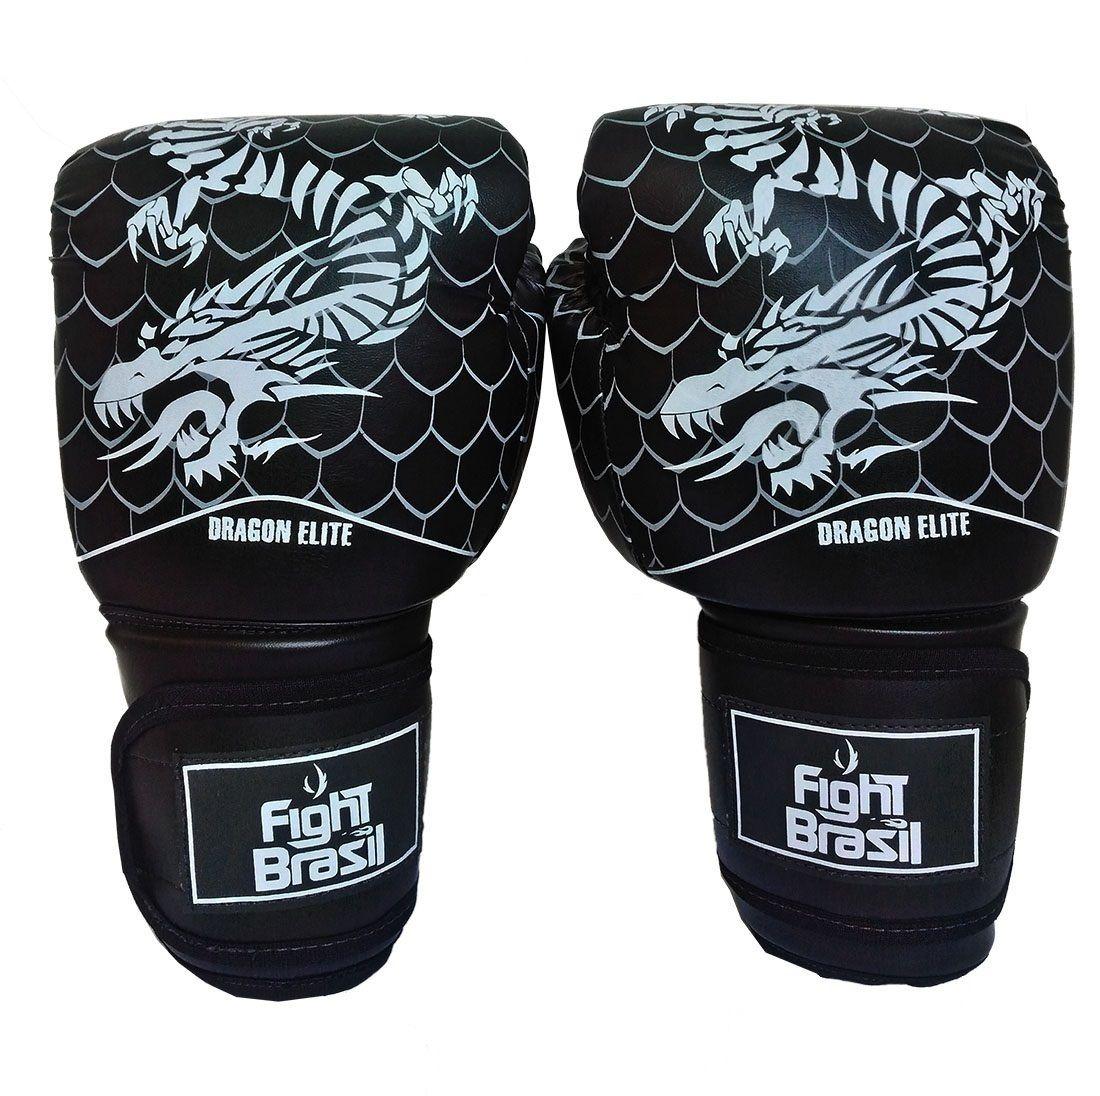 4e2aca2ad Luva Boxe Luva Muay Thai 12 Oz Fight Brasil Dragon Elite - R  109